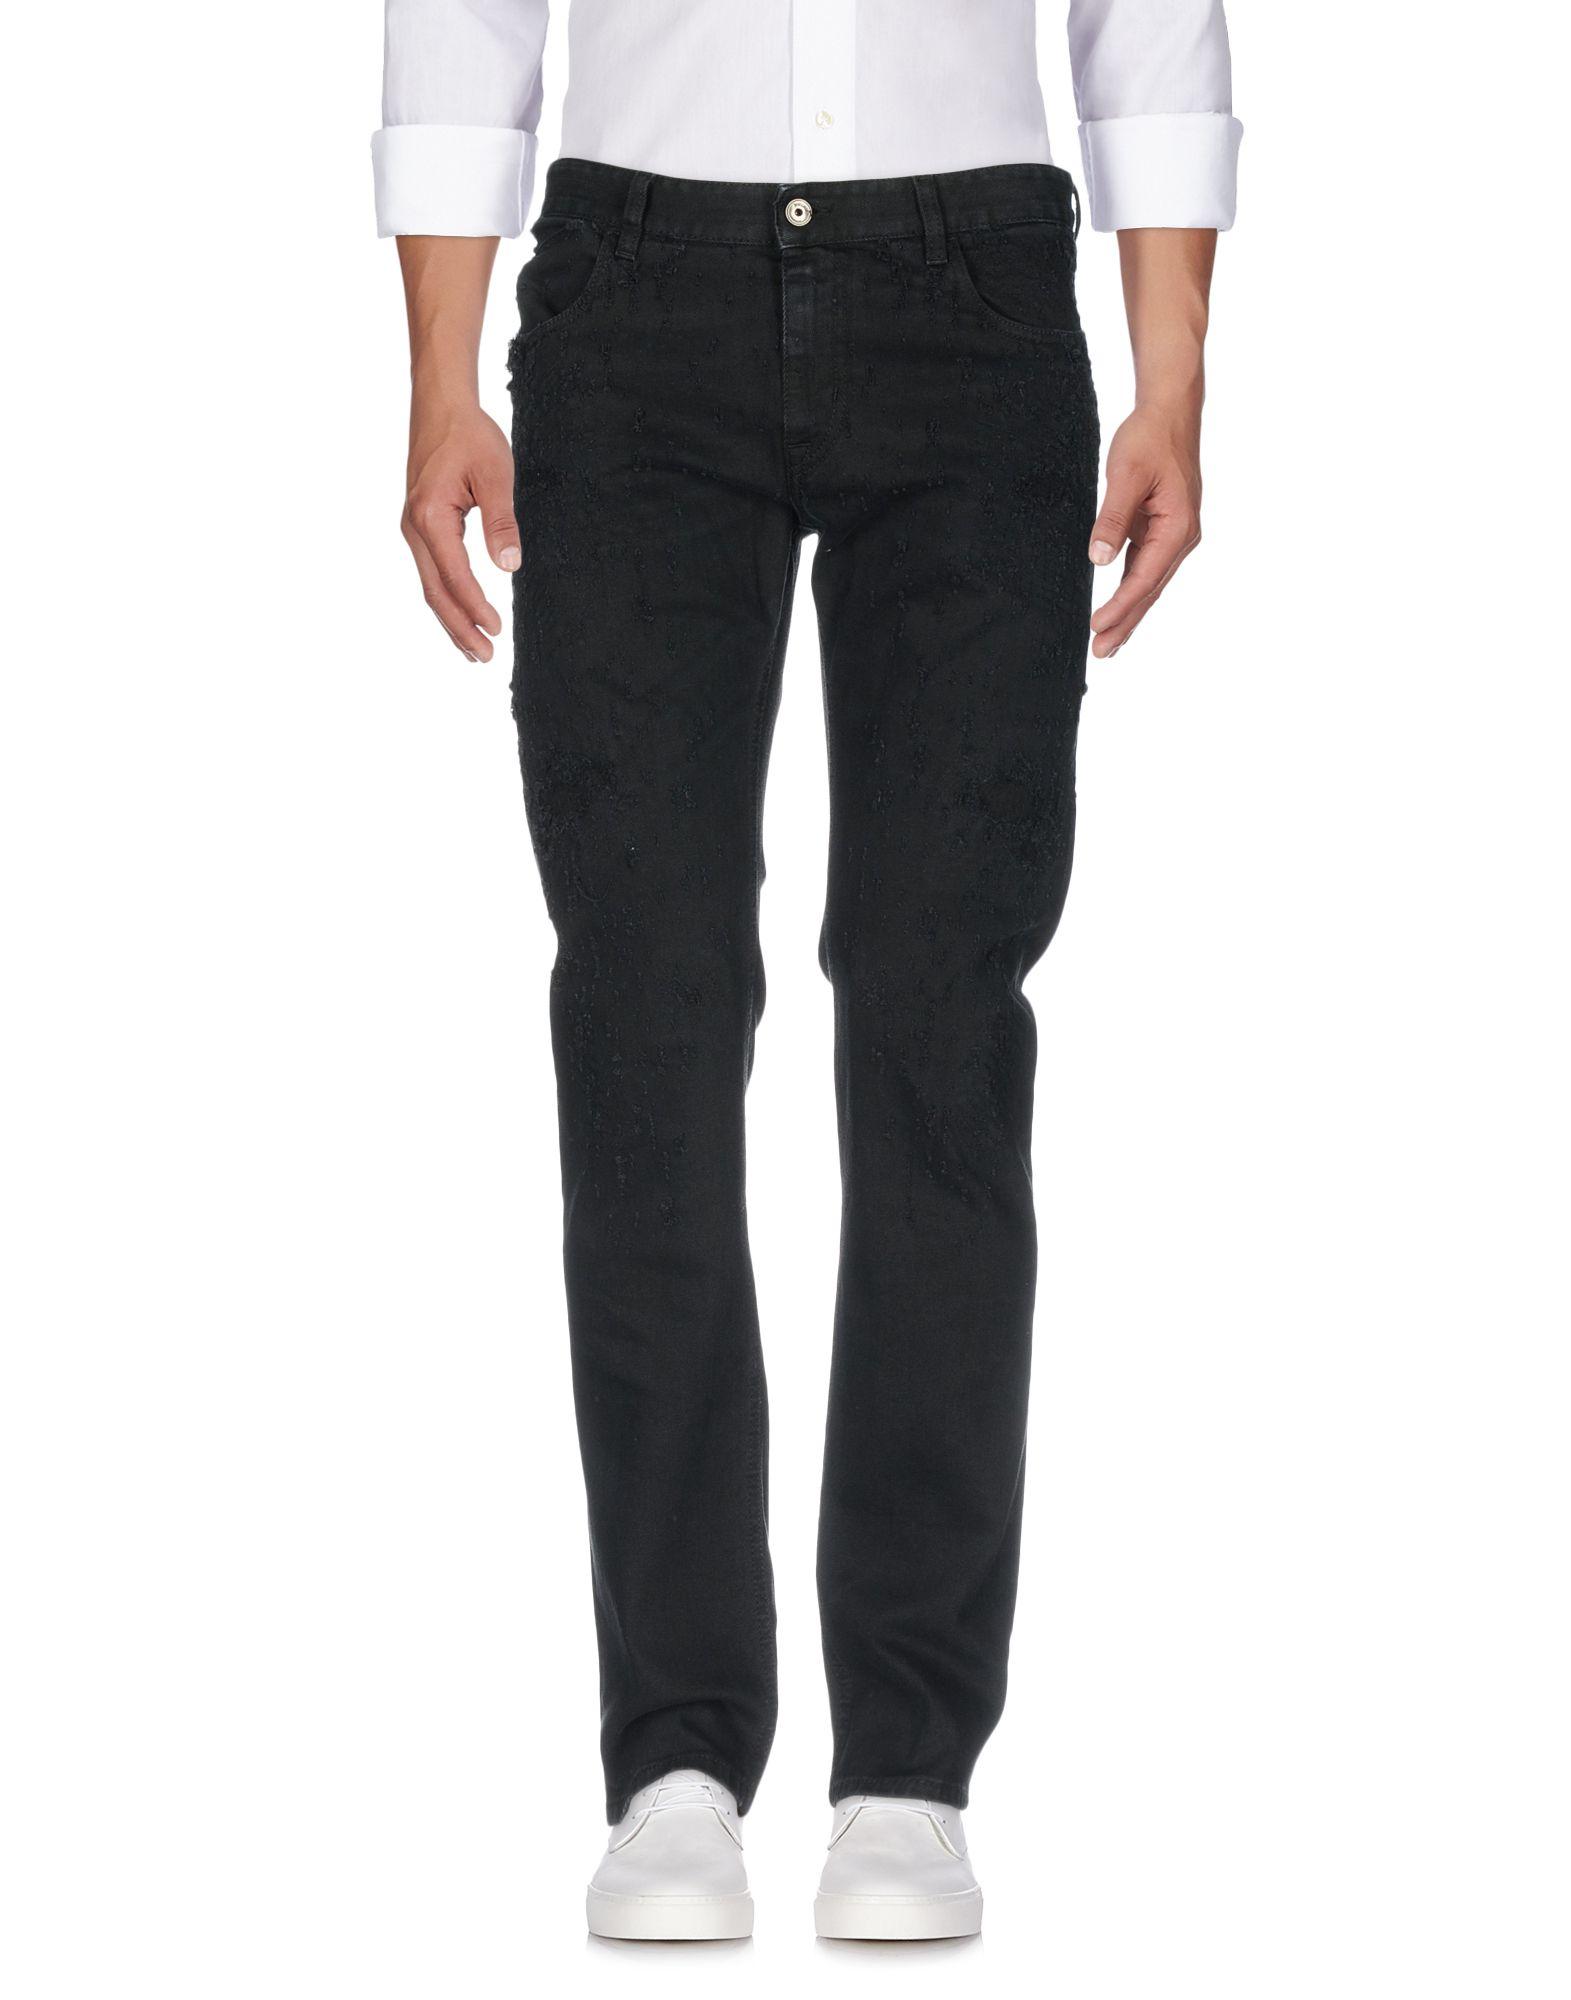 Pantaloni Jeans Just Just Just Cavalli Uomo - 42655407UQ e14902